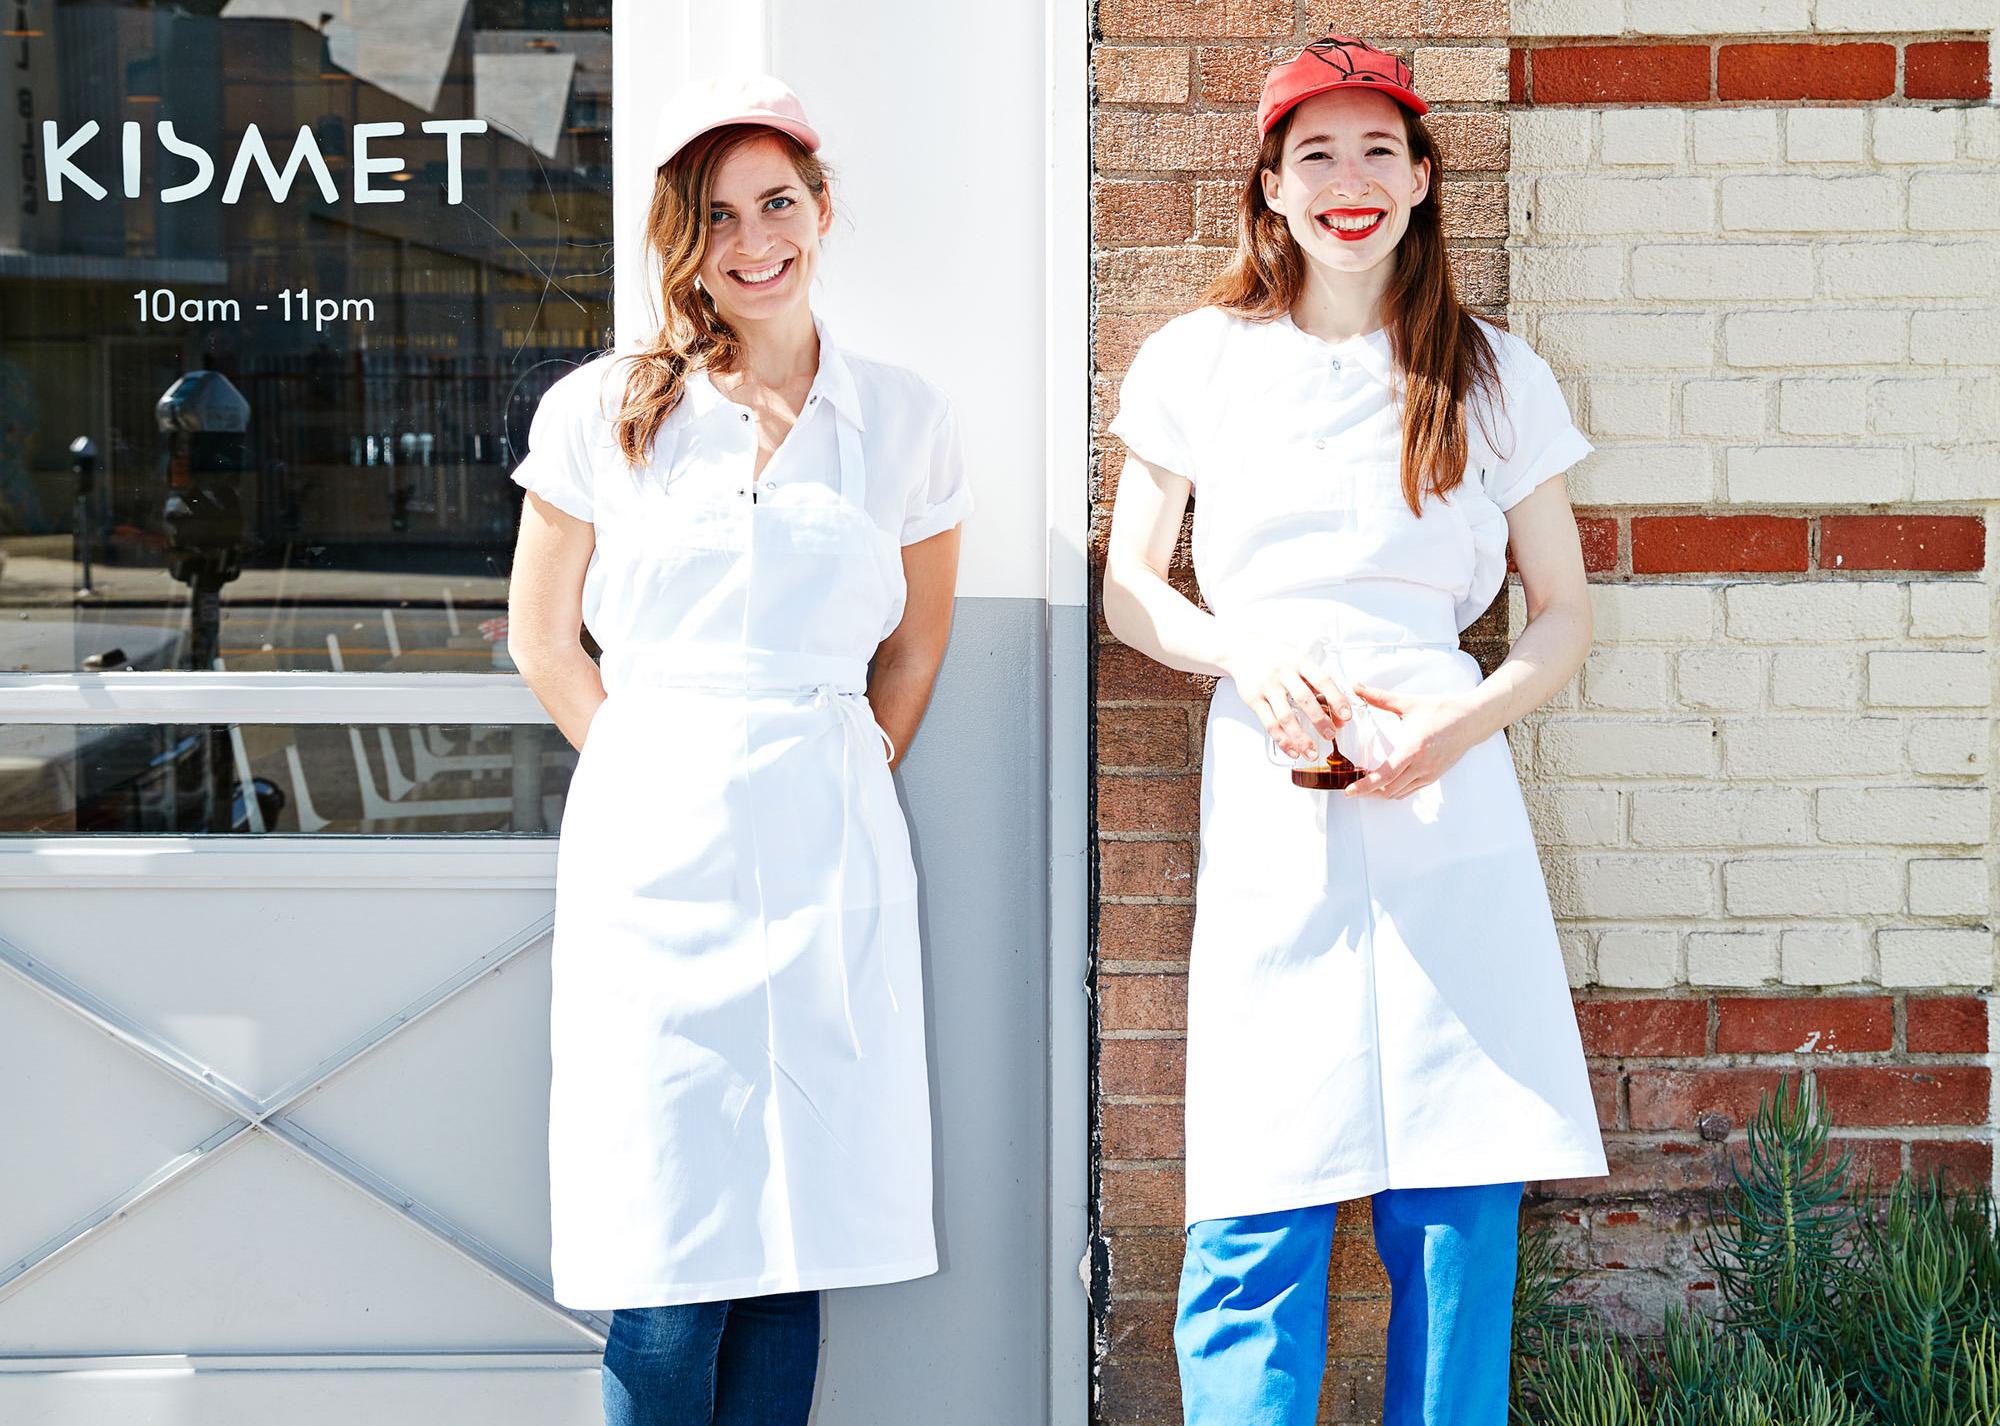 Chefs Sarah Hymanson and Sara Kramer Los Angeles Los Feliz Kismet